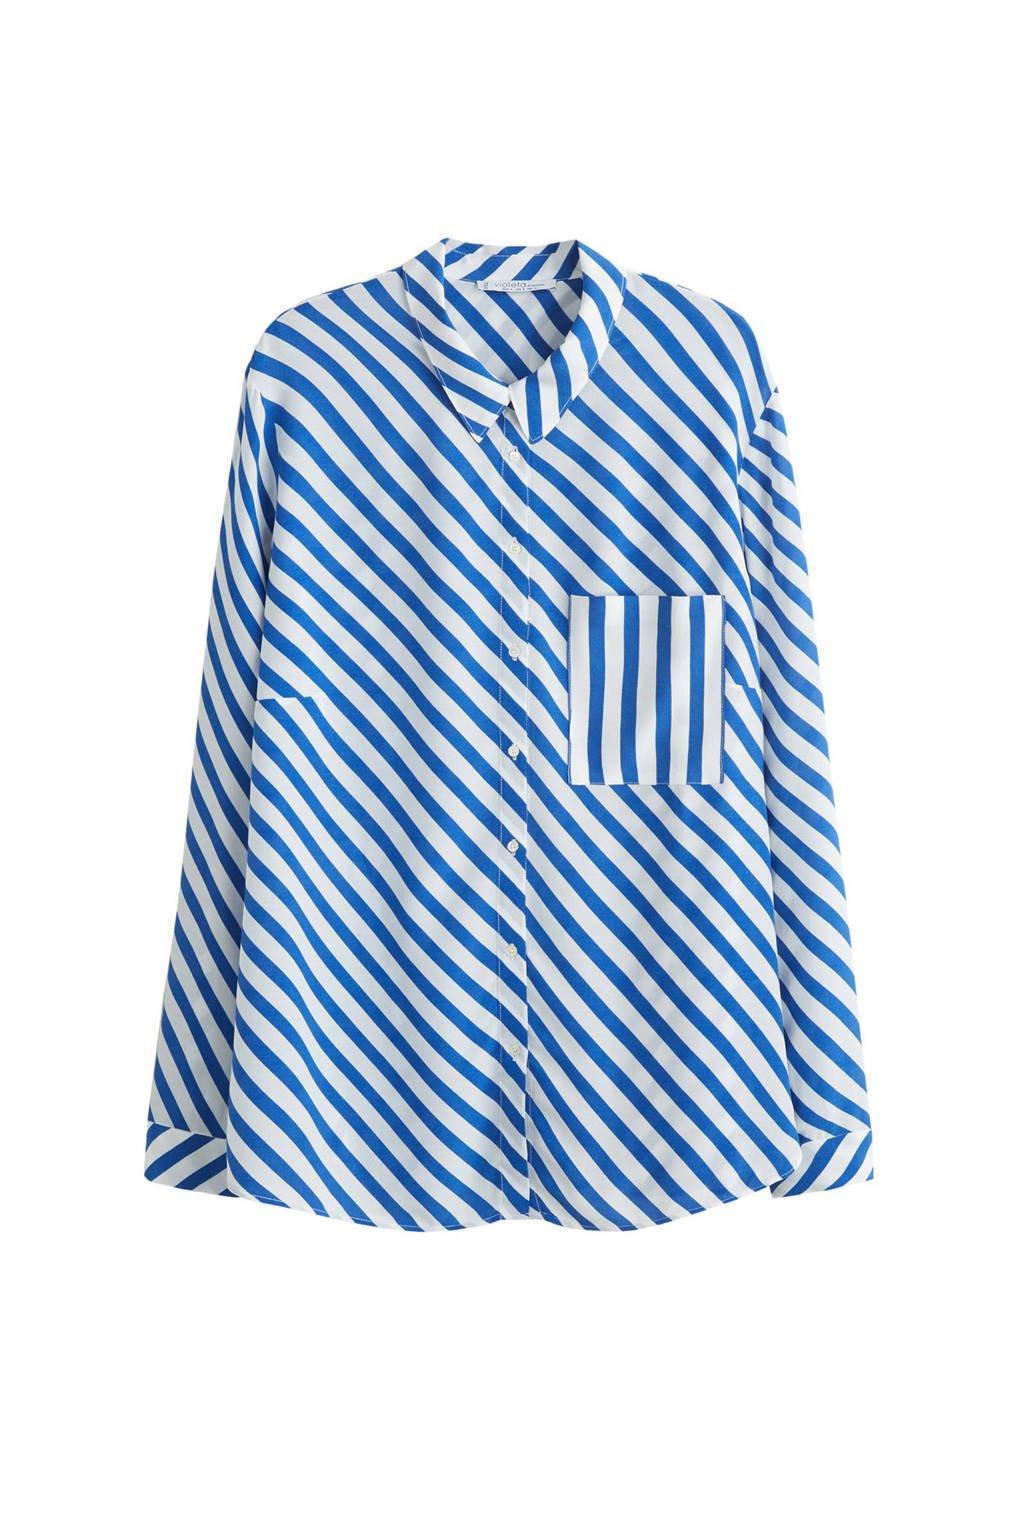 Violeta by Mango gestreepte blouse blauw, Blauw/wit